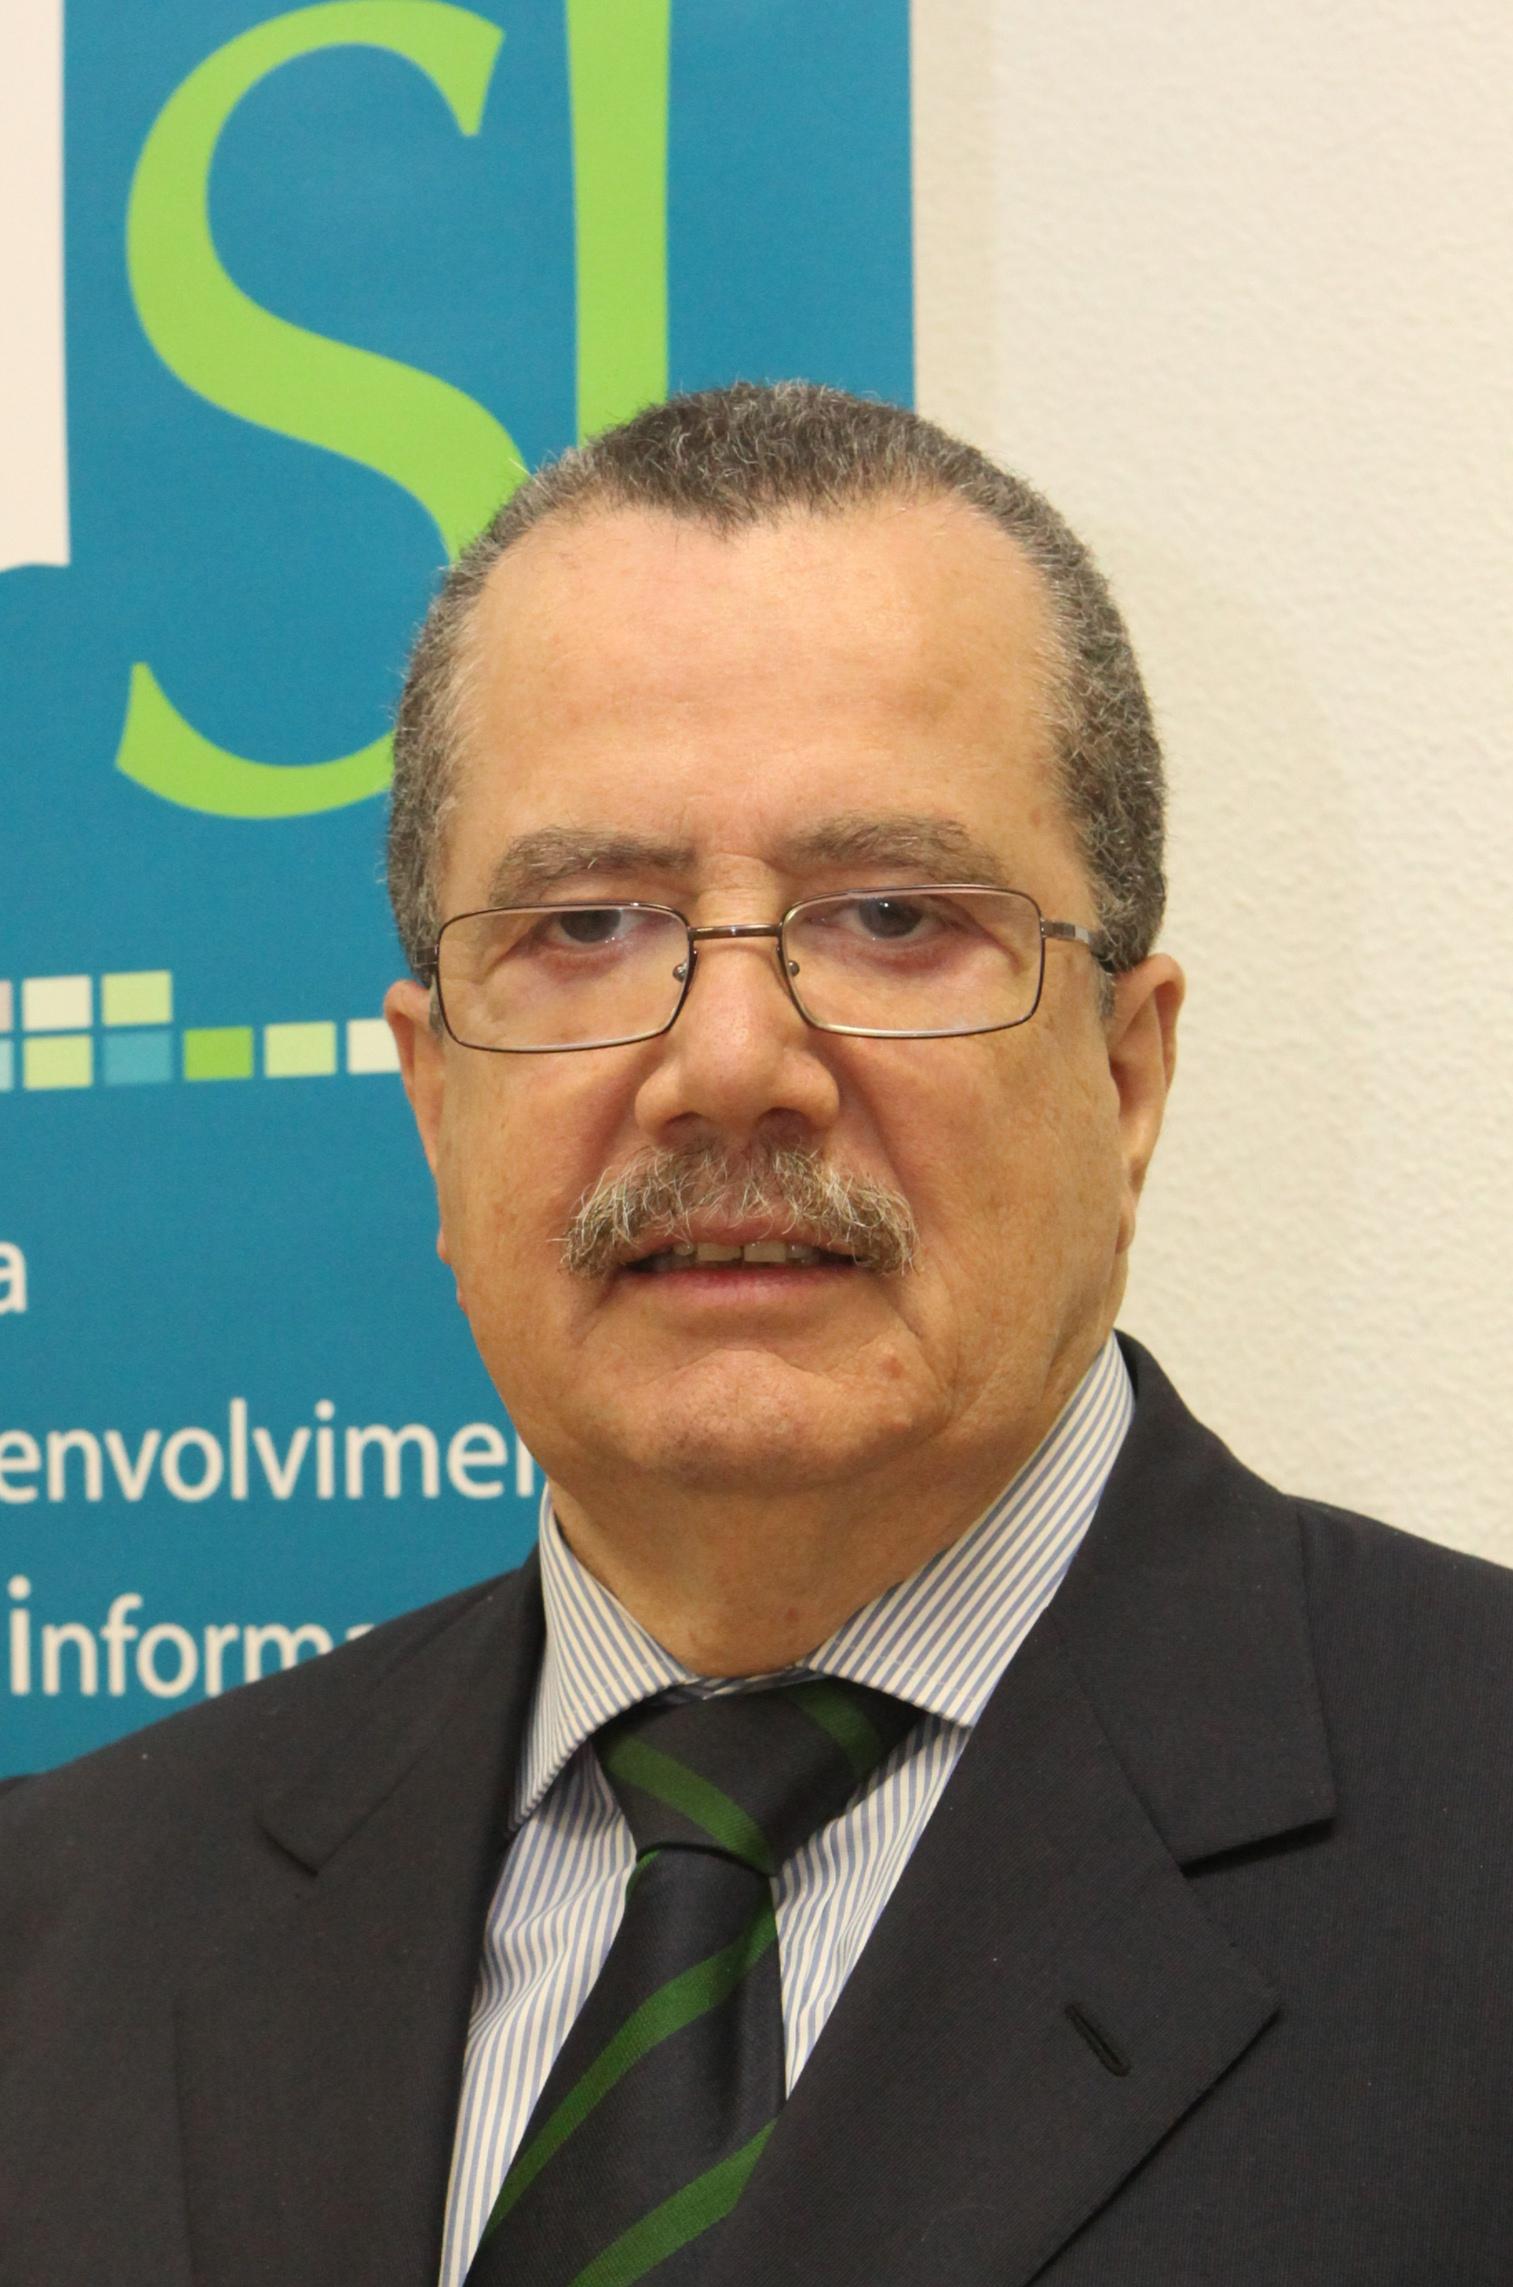 Luís Vidigal, E-Government evangelist